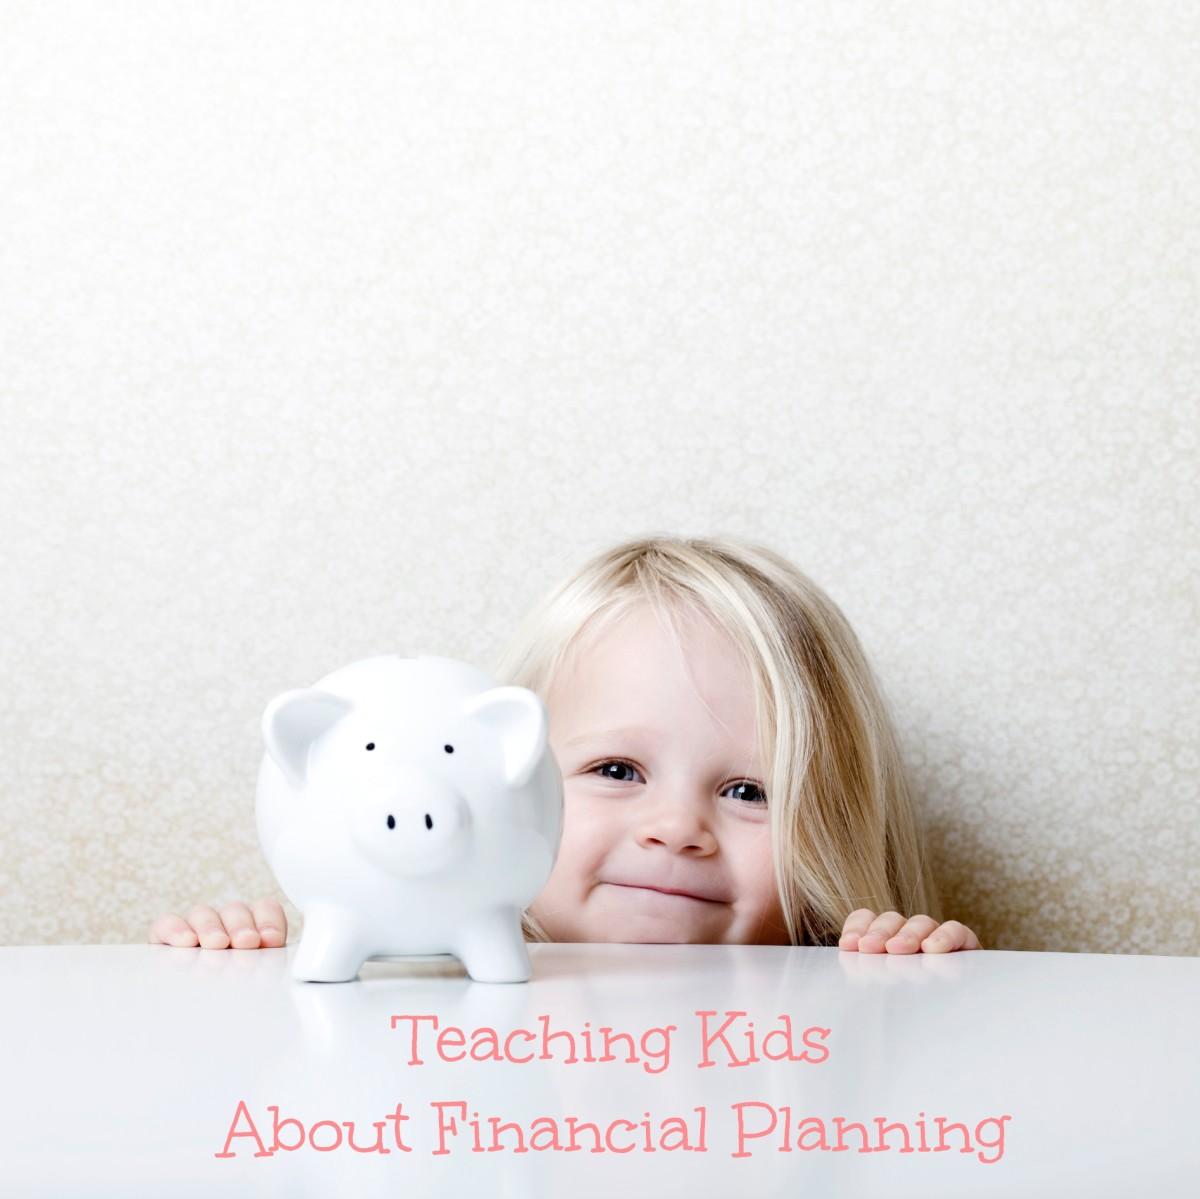 Teach Kids About Financial Planning